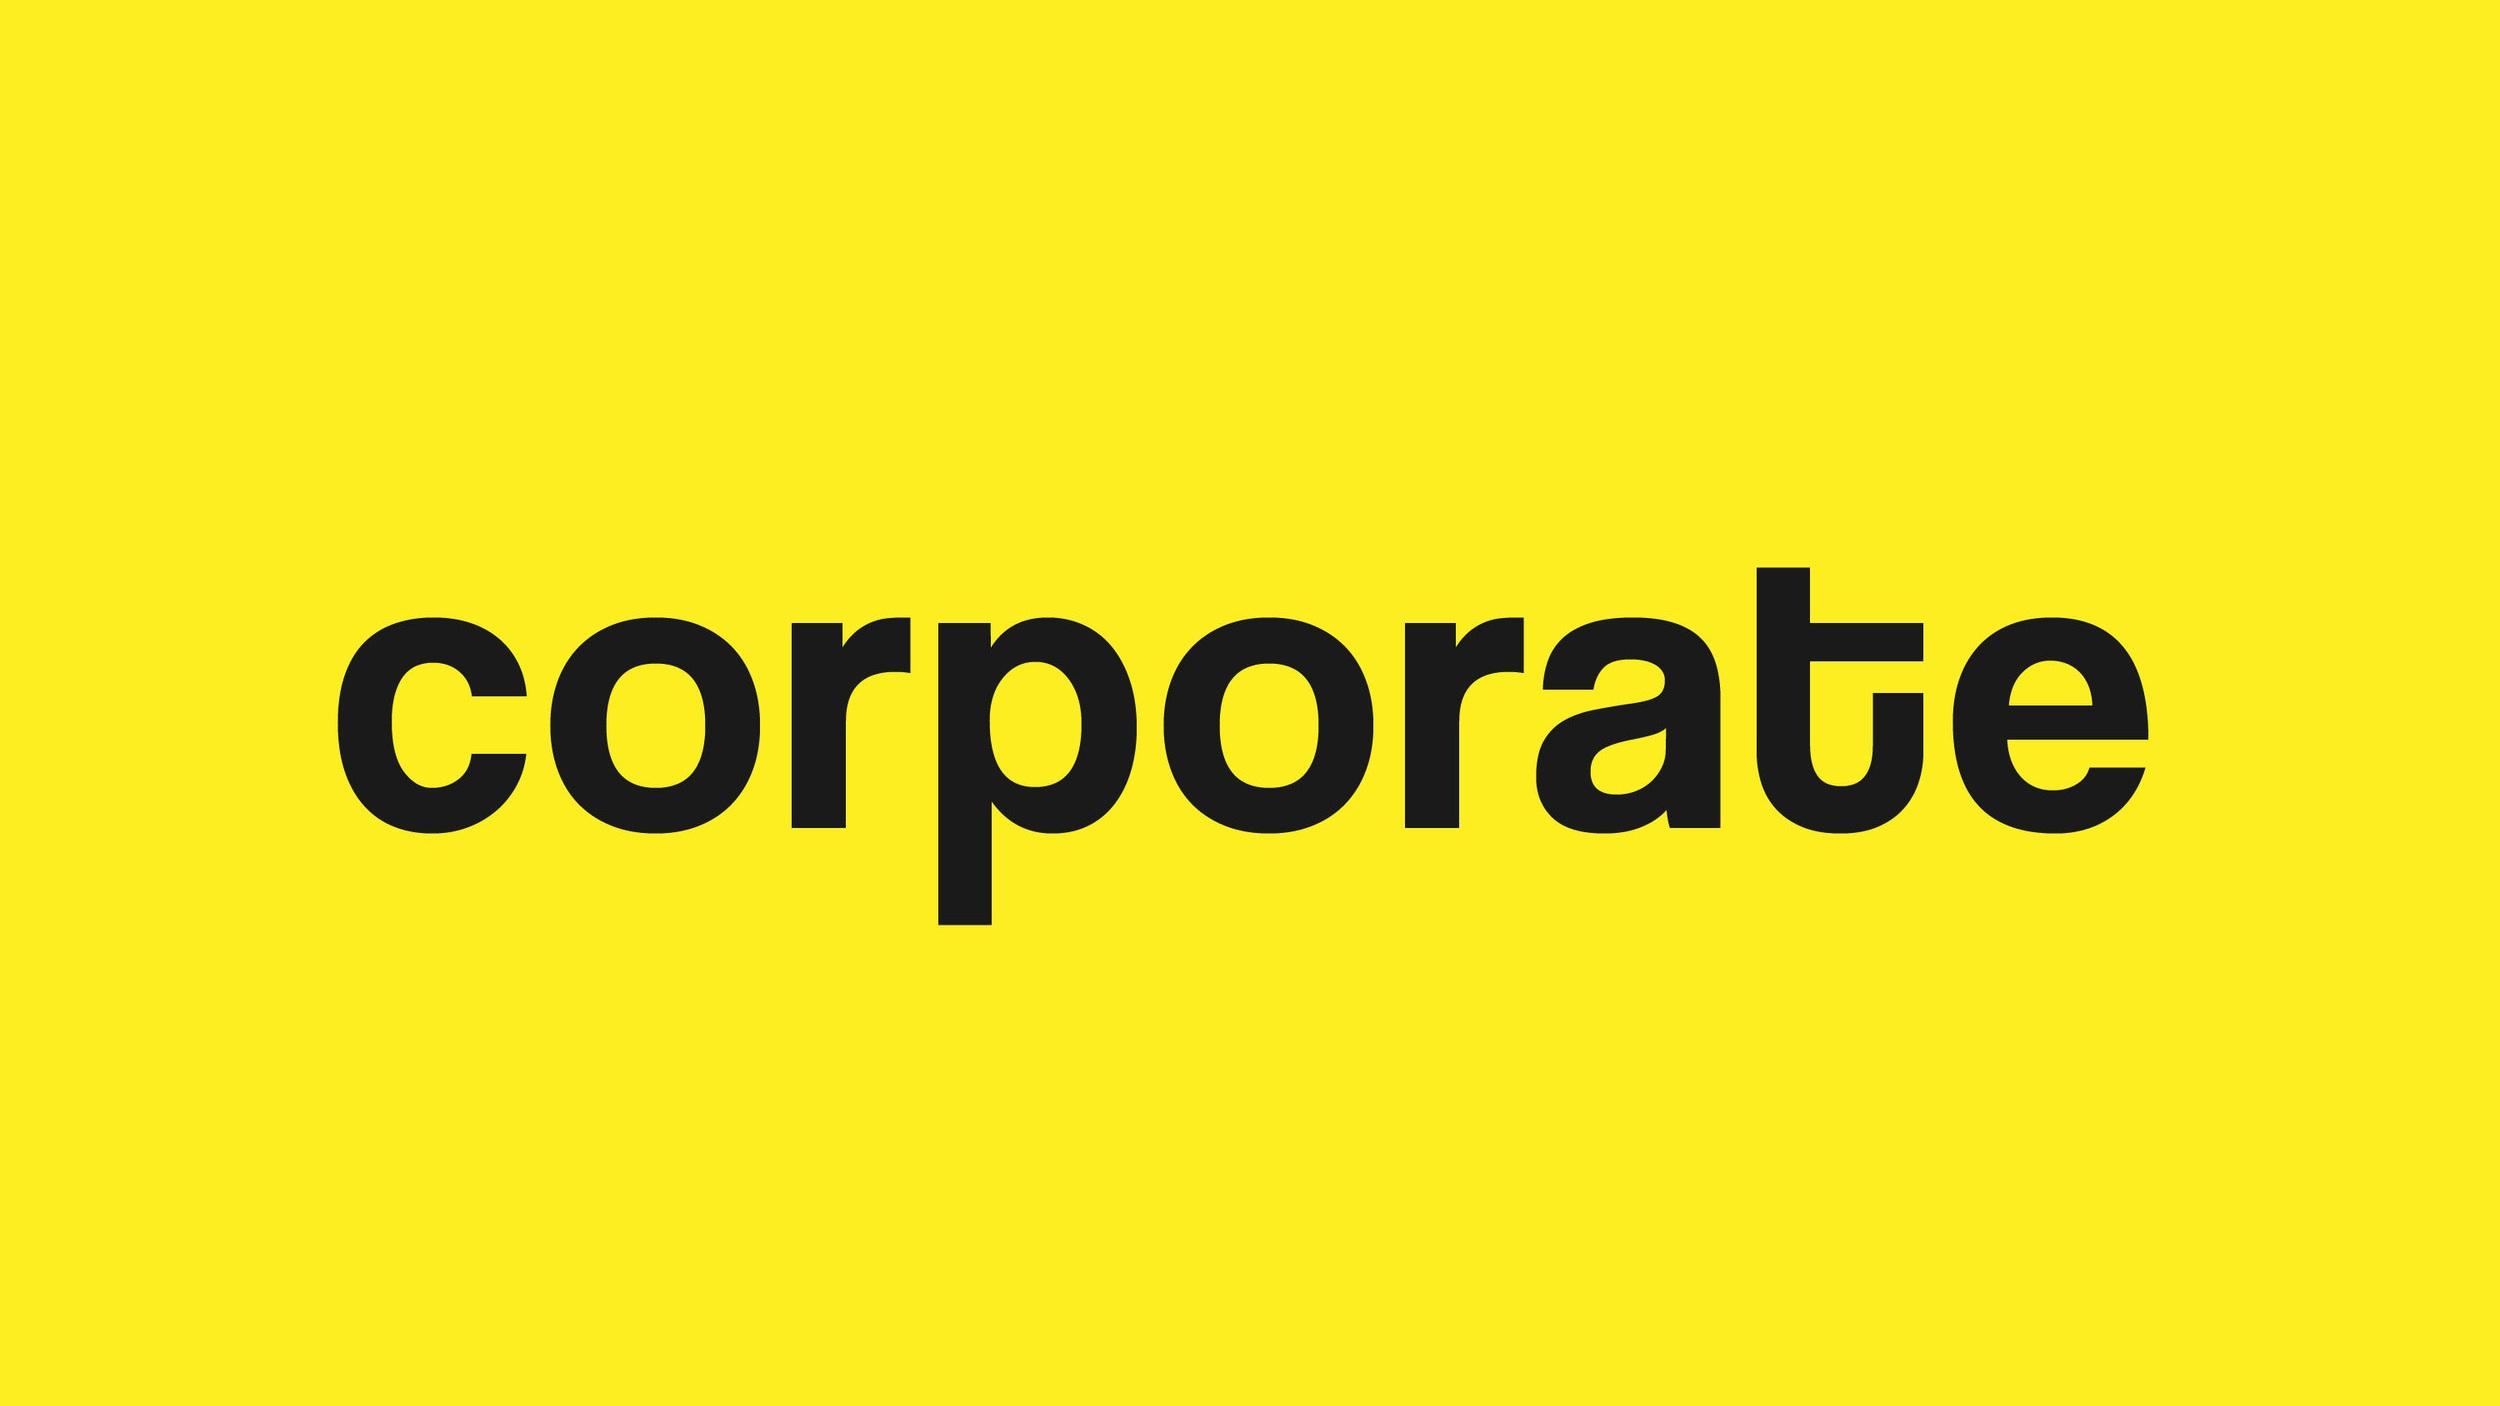 corporate1-01.jpg